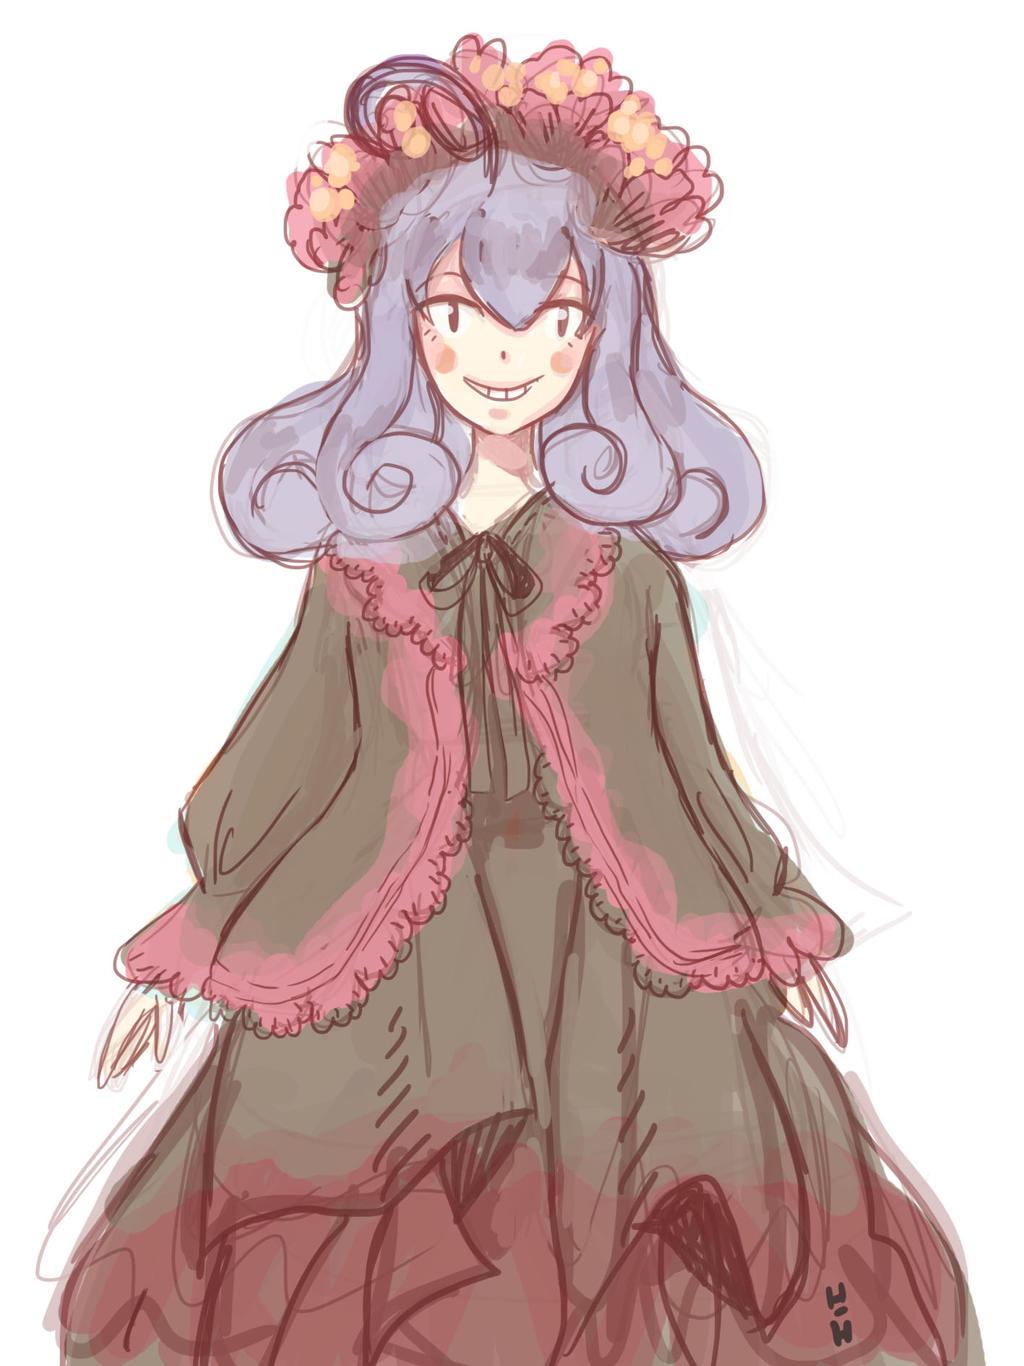 Sketch: Mura automne by hiromihana